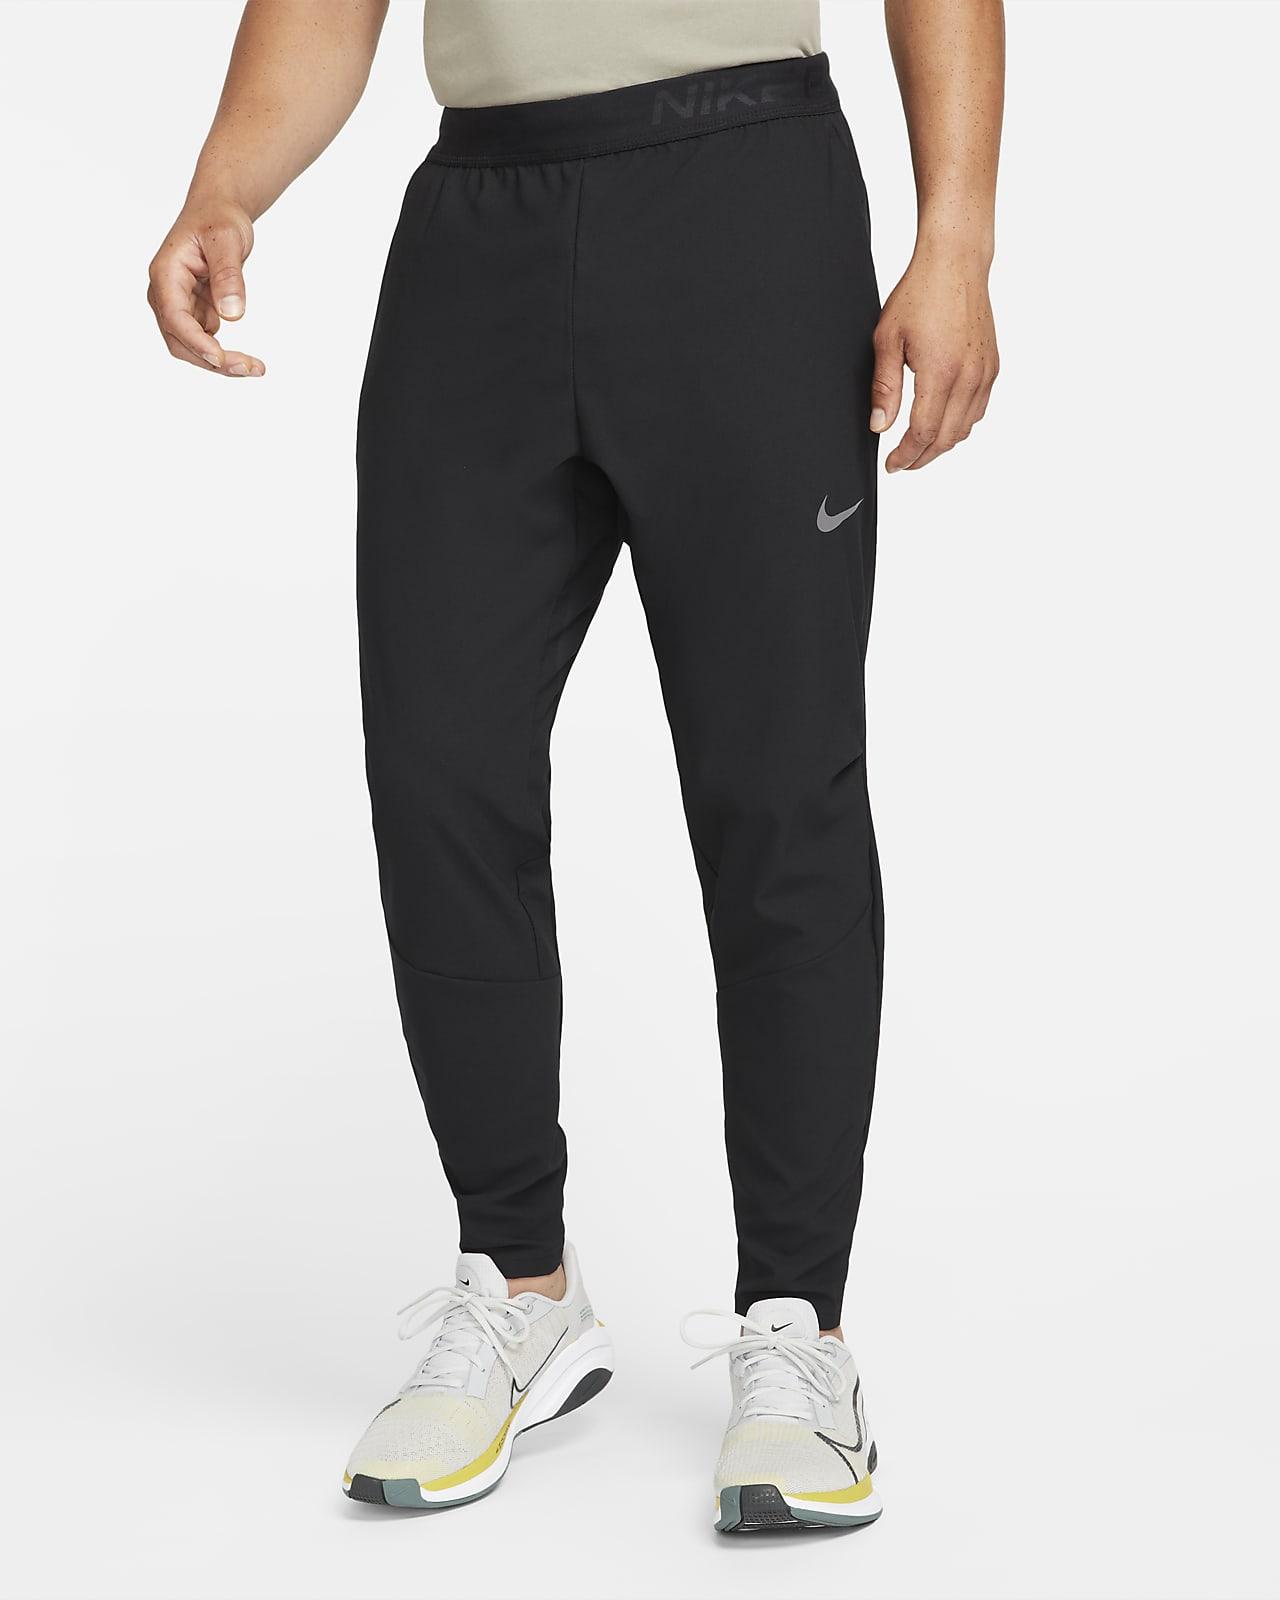 Pantaloni da allenamento Nike Flex - Uomo